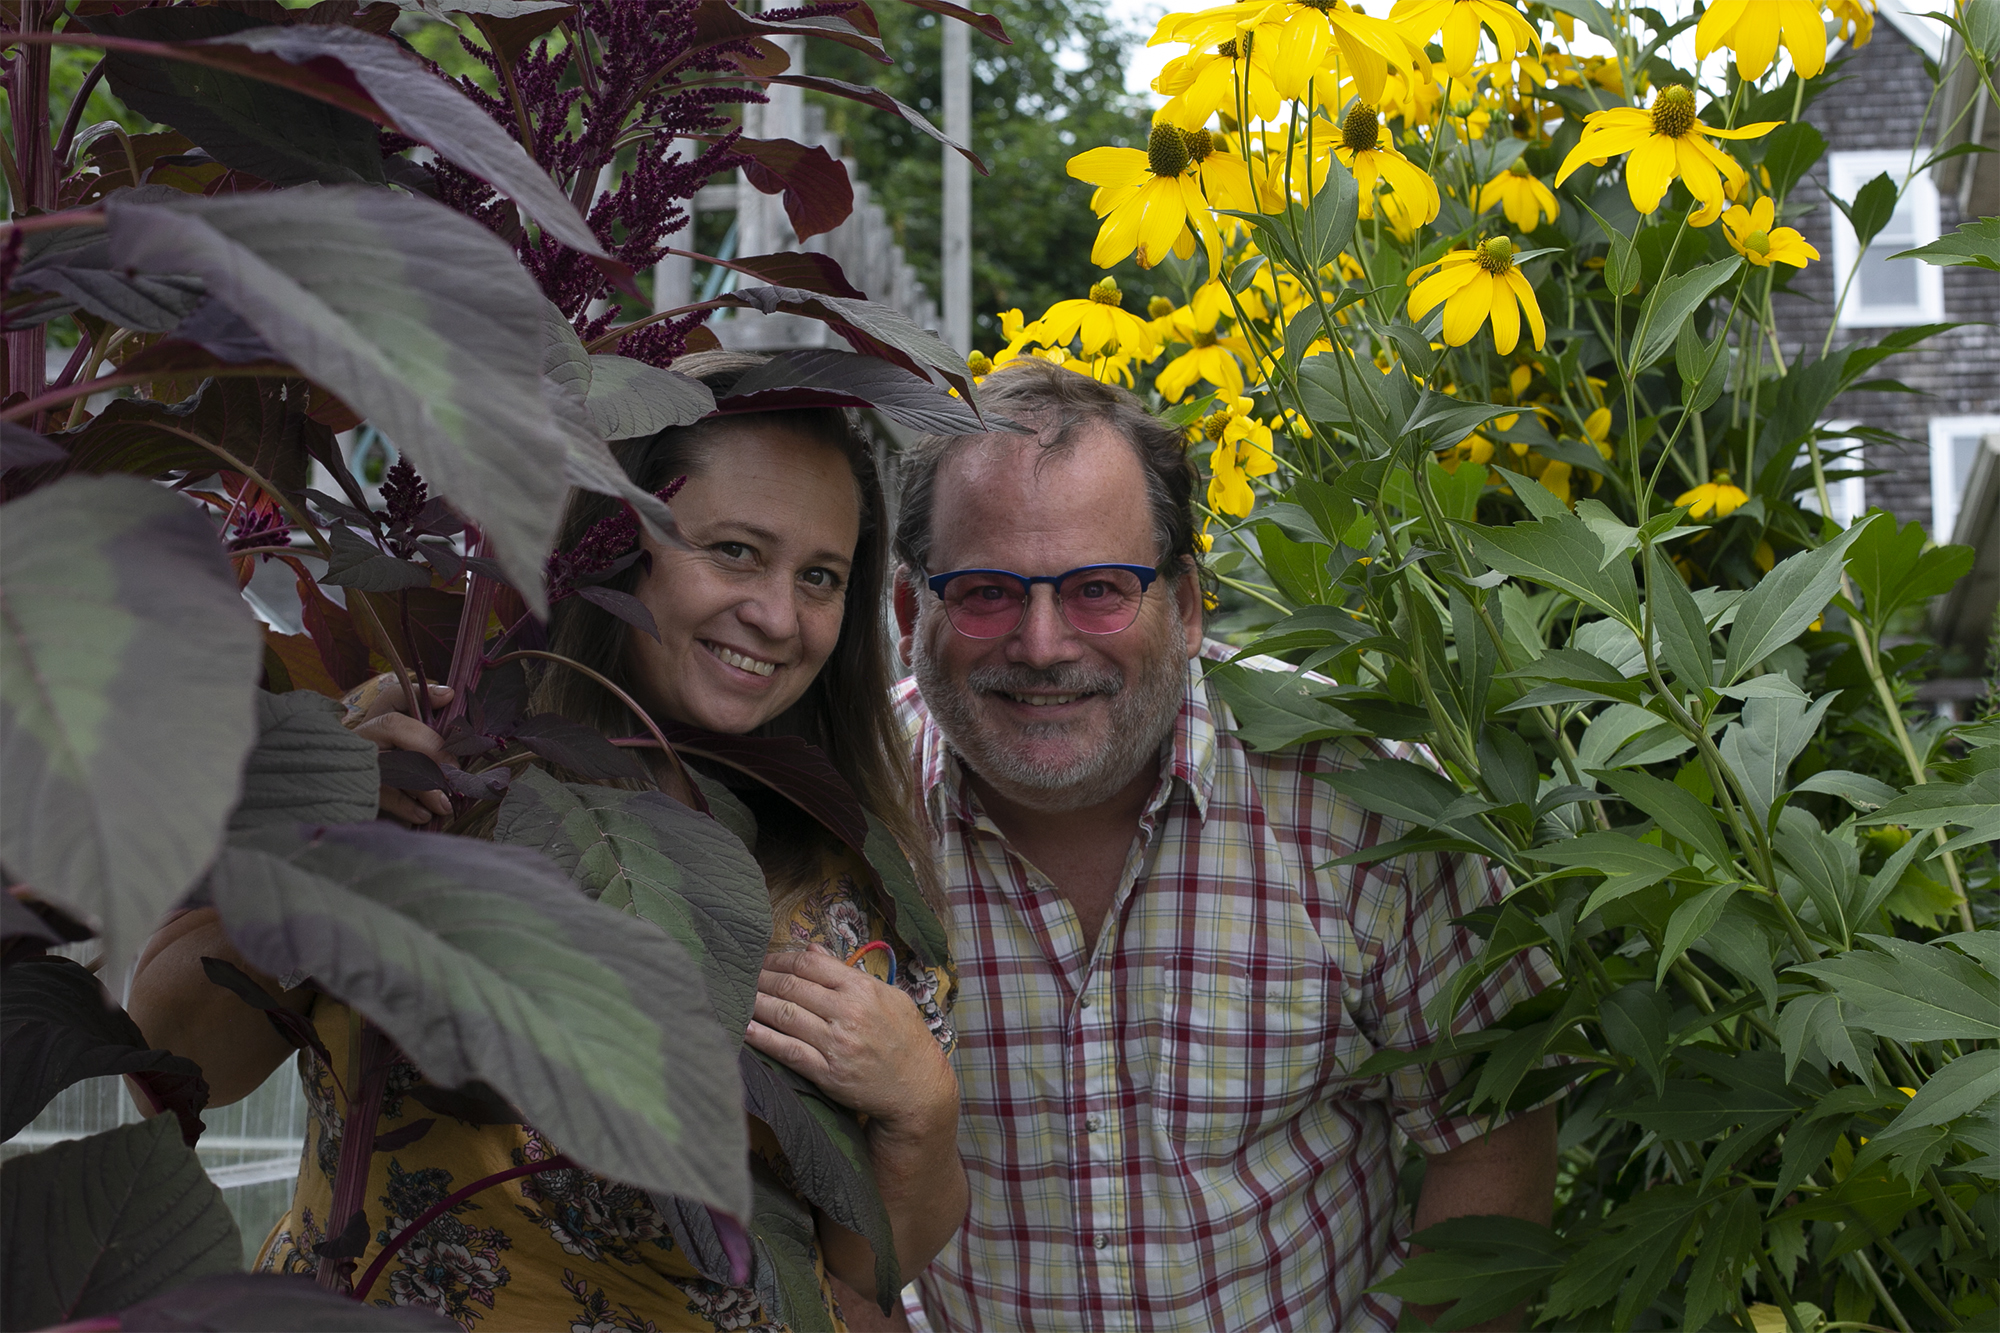 Backyard Growers founders, Lara Lepionka and Stevens Brosnihan (Photo: BYG)